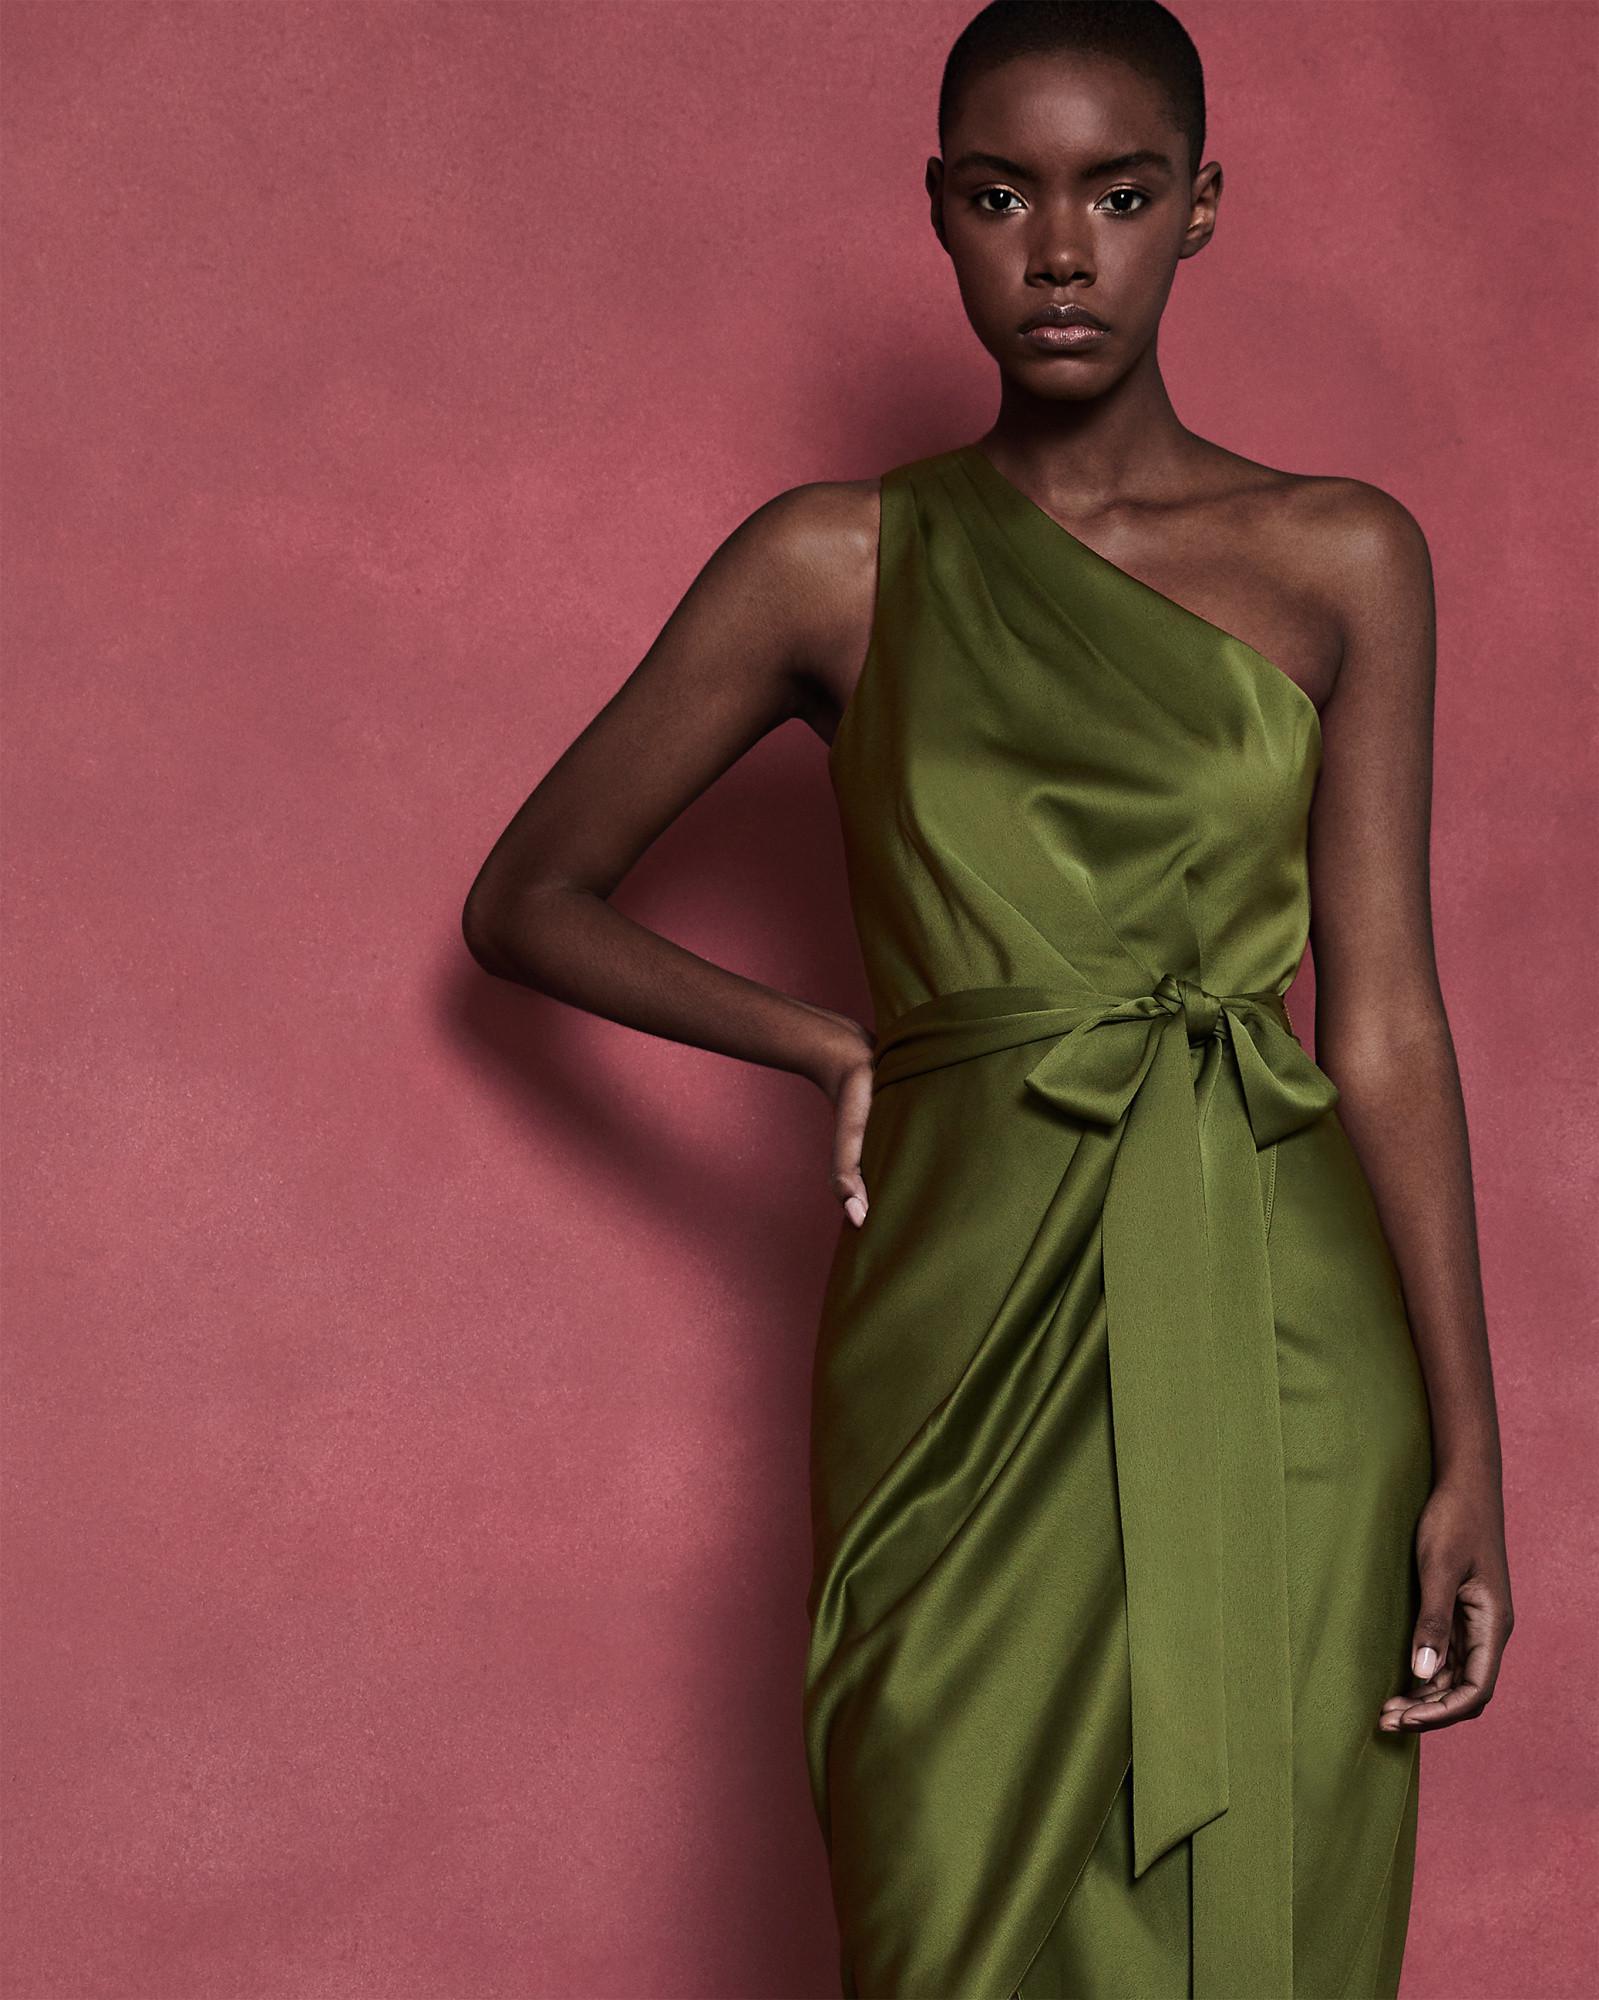 c9628c2f89e44 ... Ted Baker - Green One Shoulder Drape Midi Dress - Lyst. View fullscreen  first rate ...